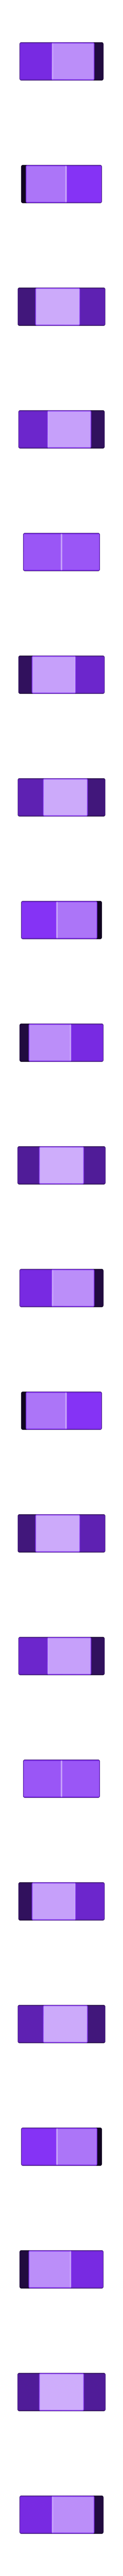 tuerca 6mm.STL Download free STL file headlamp for 4mm LED lights • 3D printing object, jru